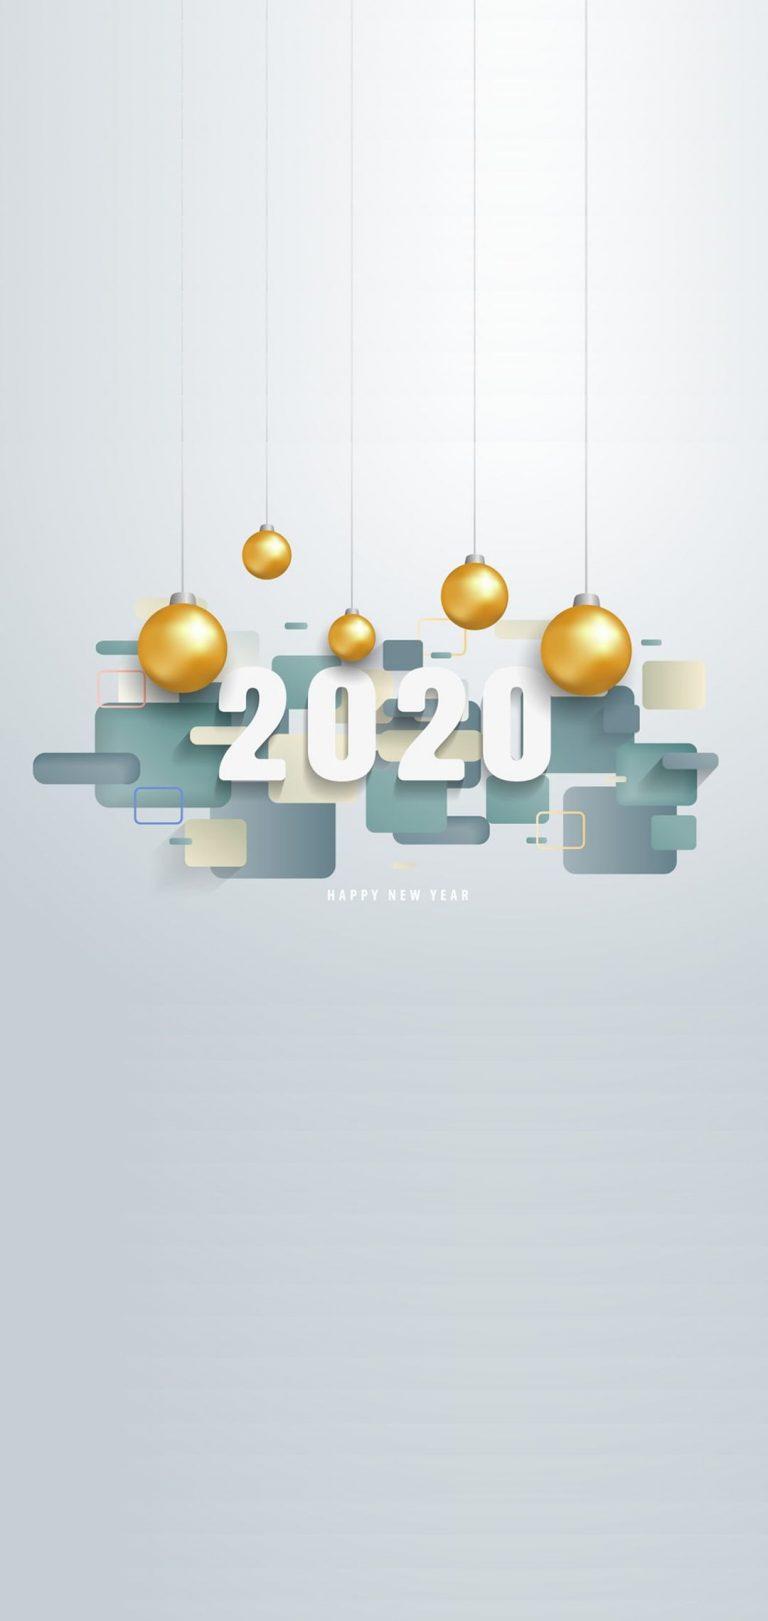 Happy New Year 2020 Phone Wallpaper 16 - [1080x2280]